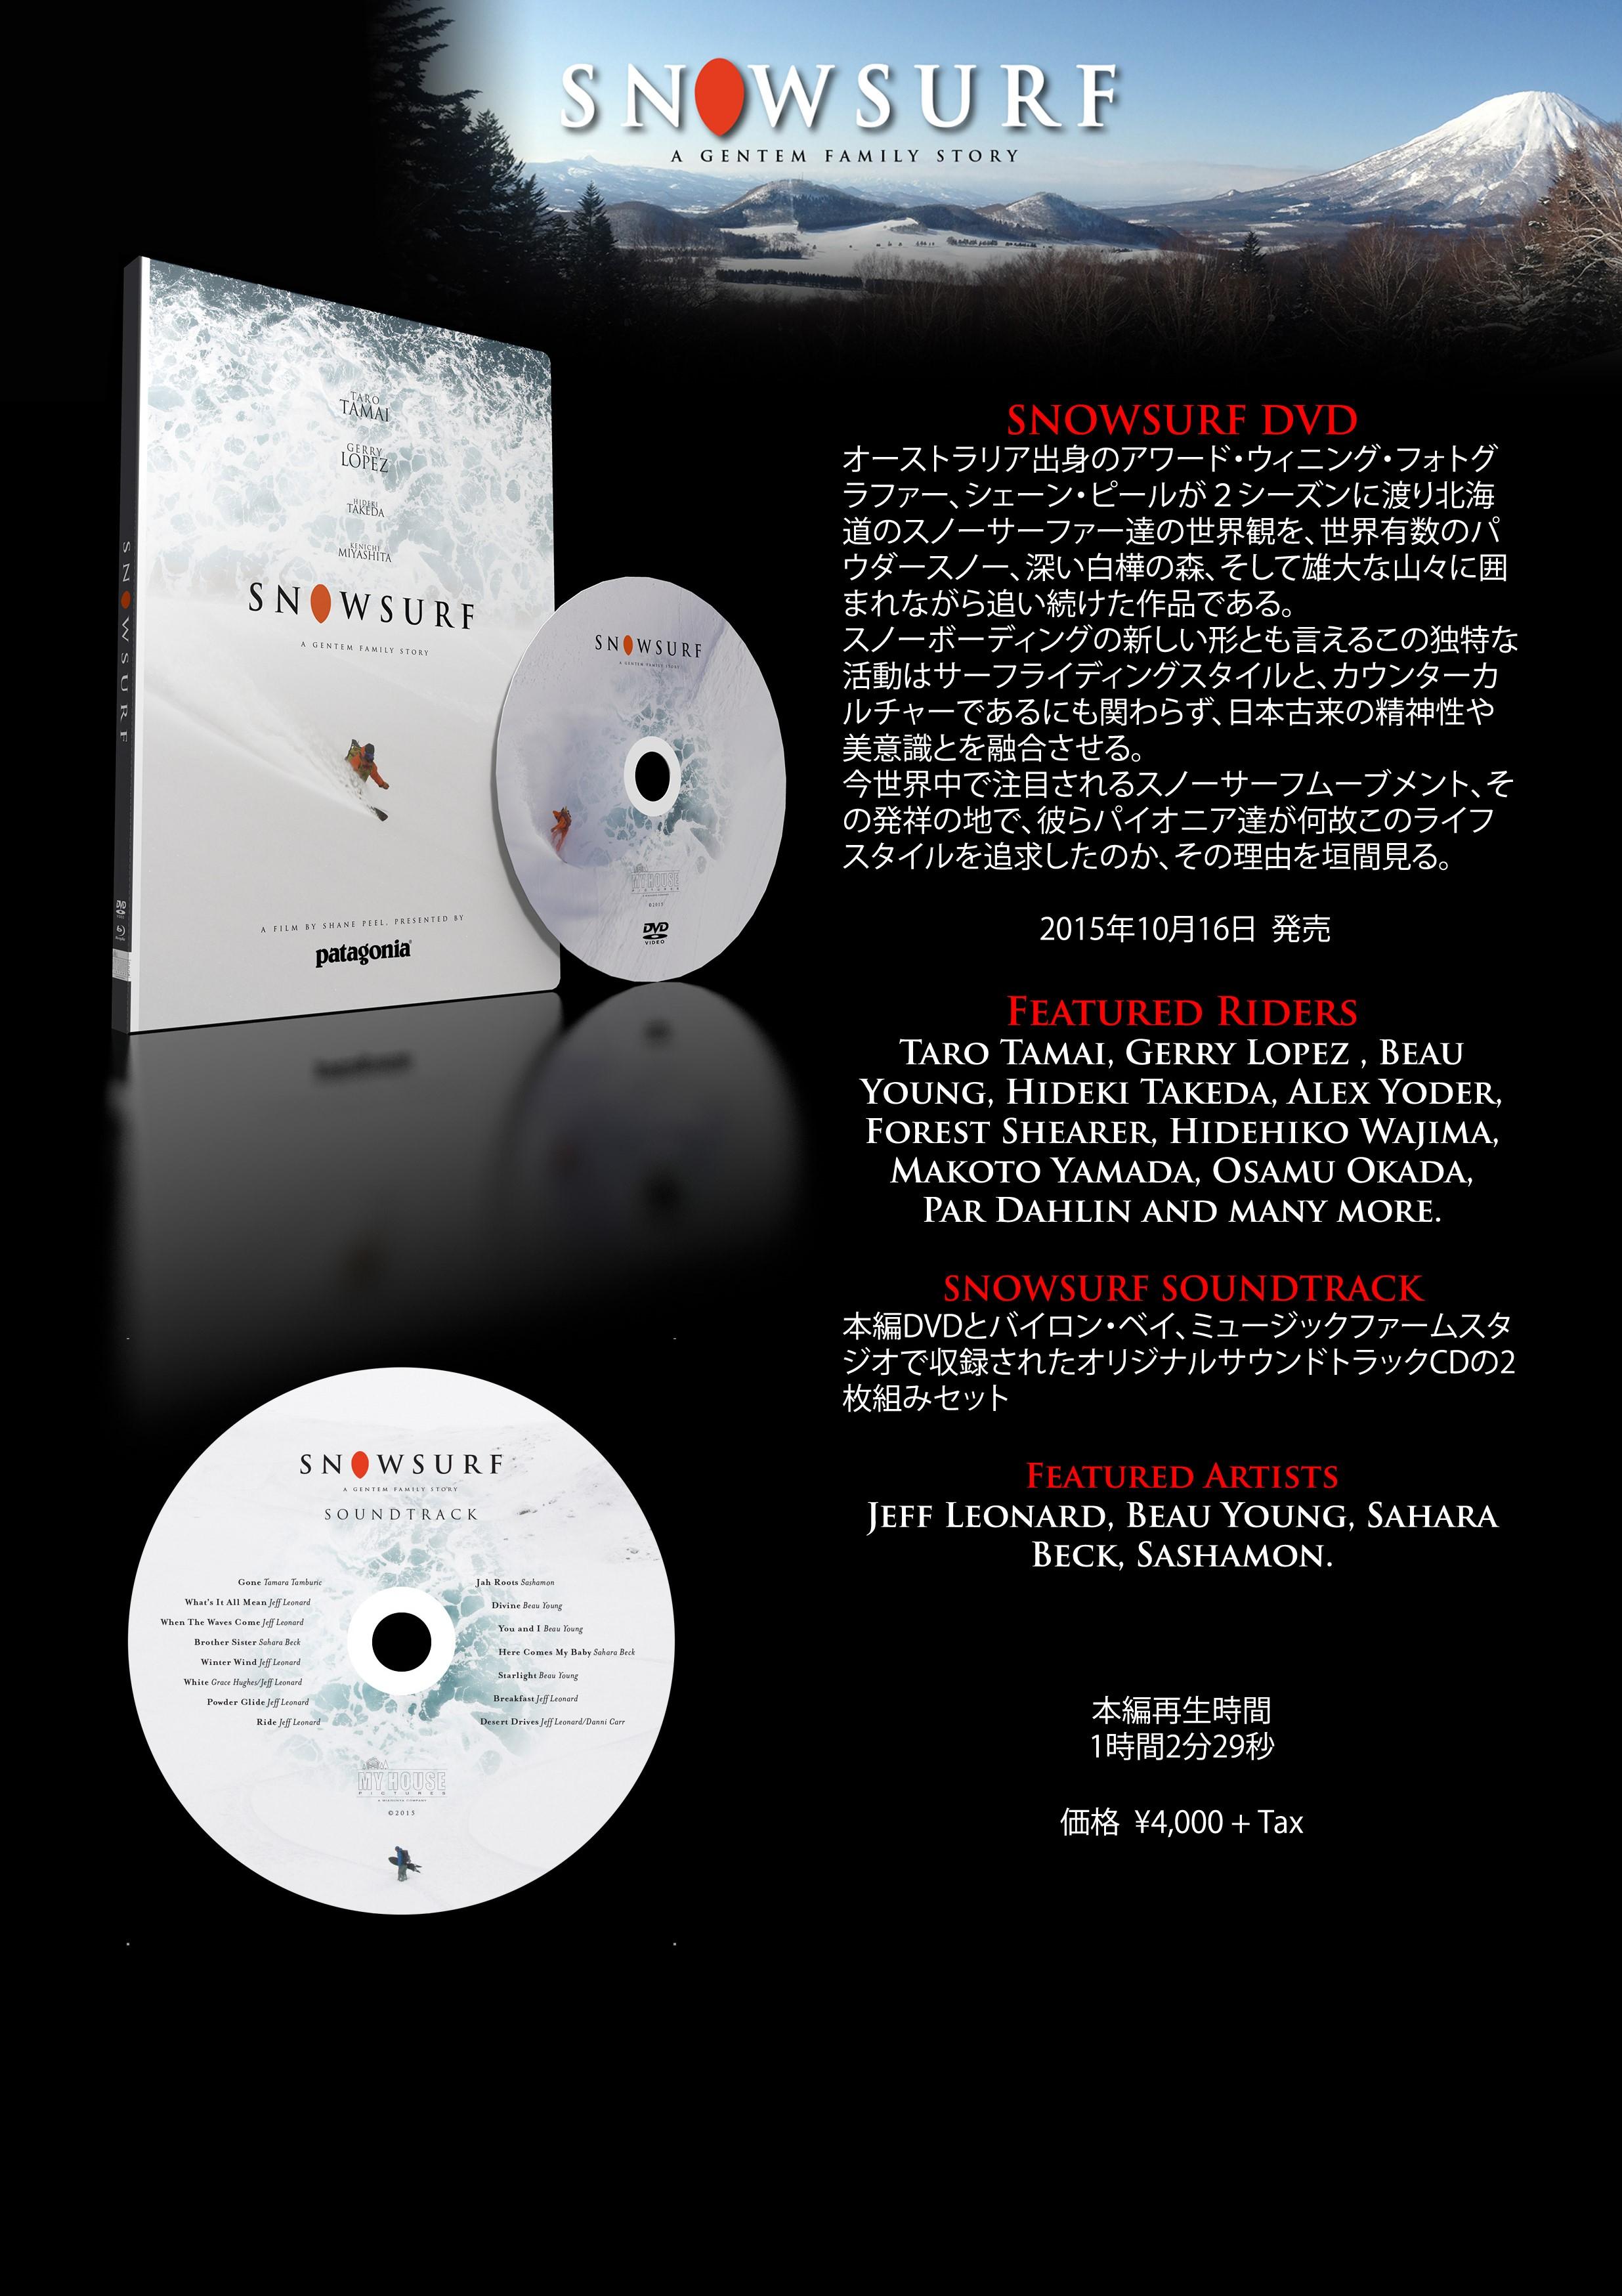 SNOWSURF-DVD-Promo-nihongo